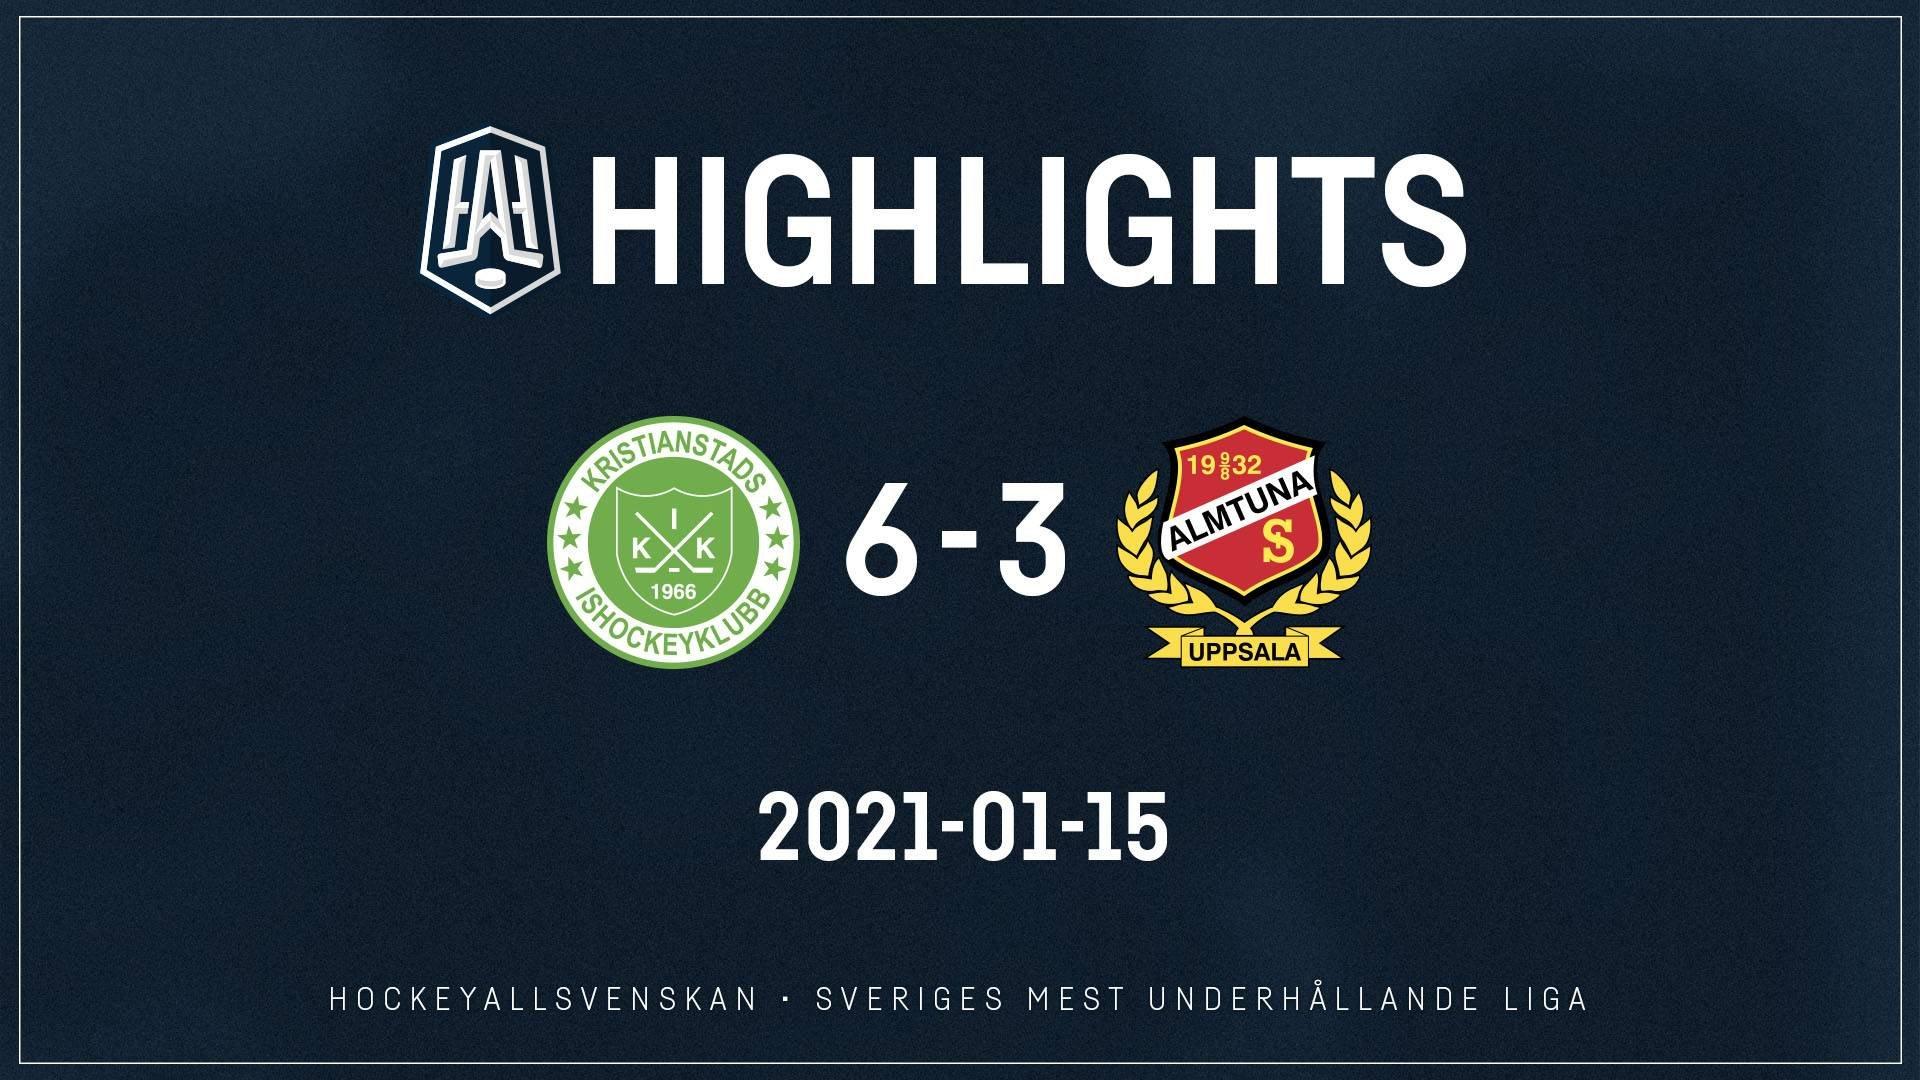 2021-01-15 Kristianstad - Almtuna 6-3